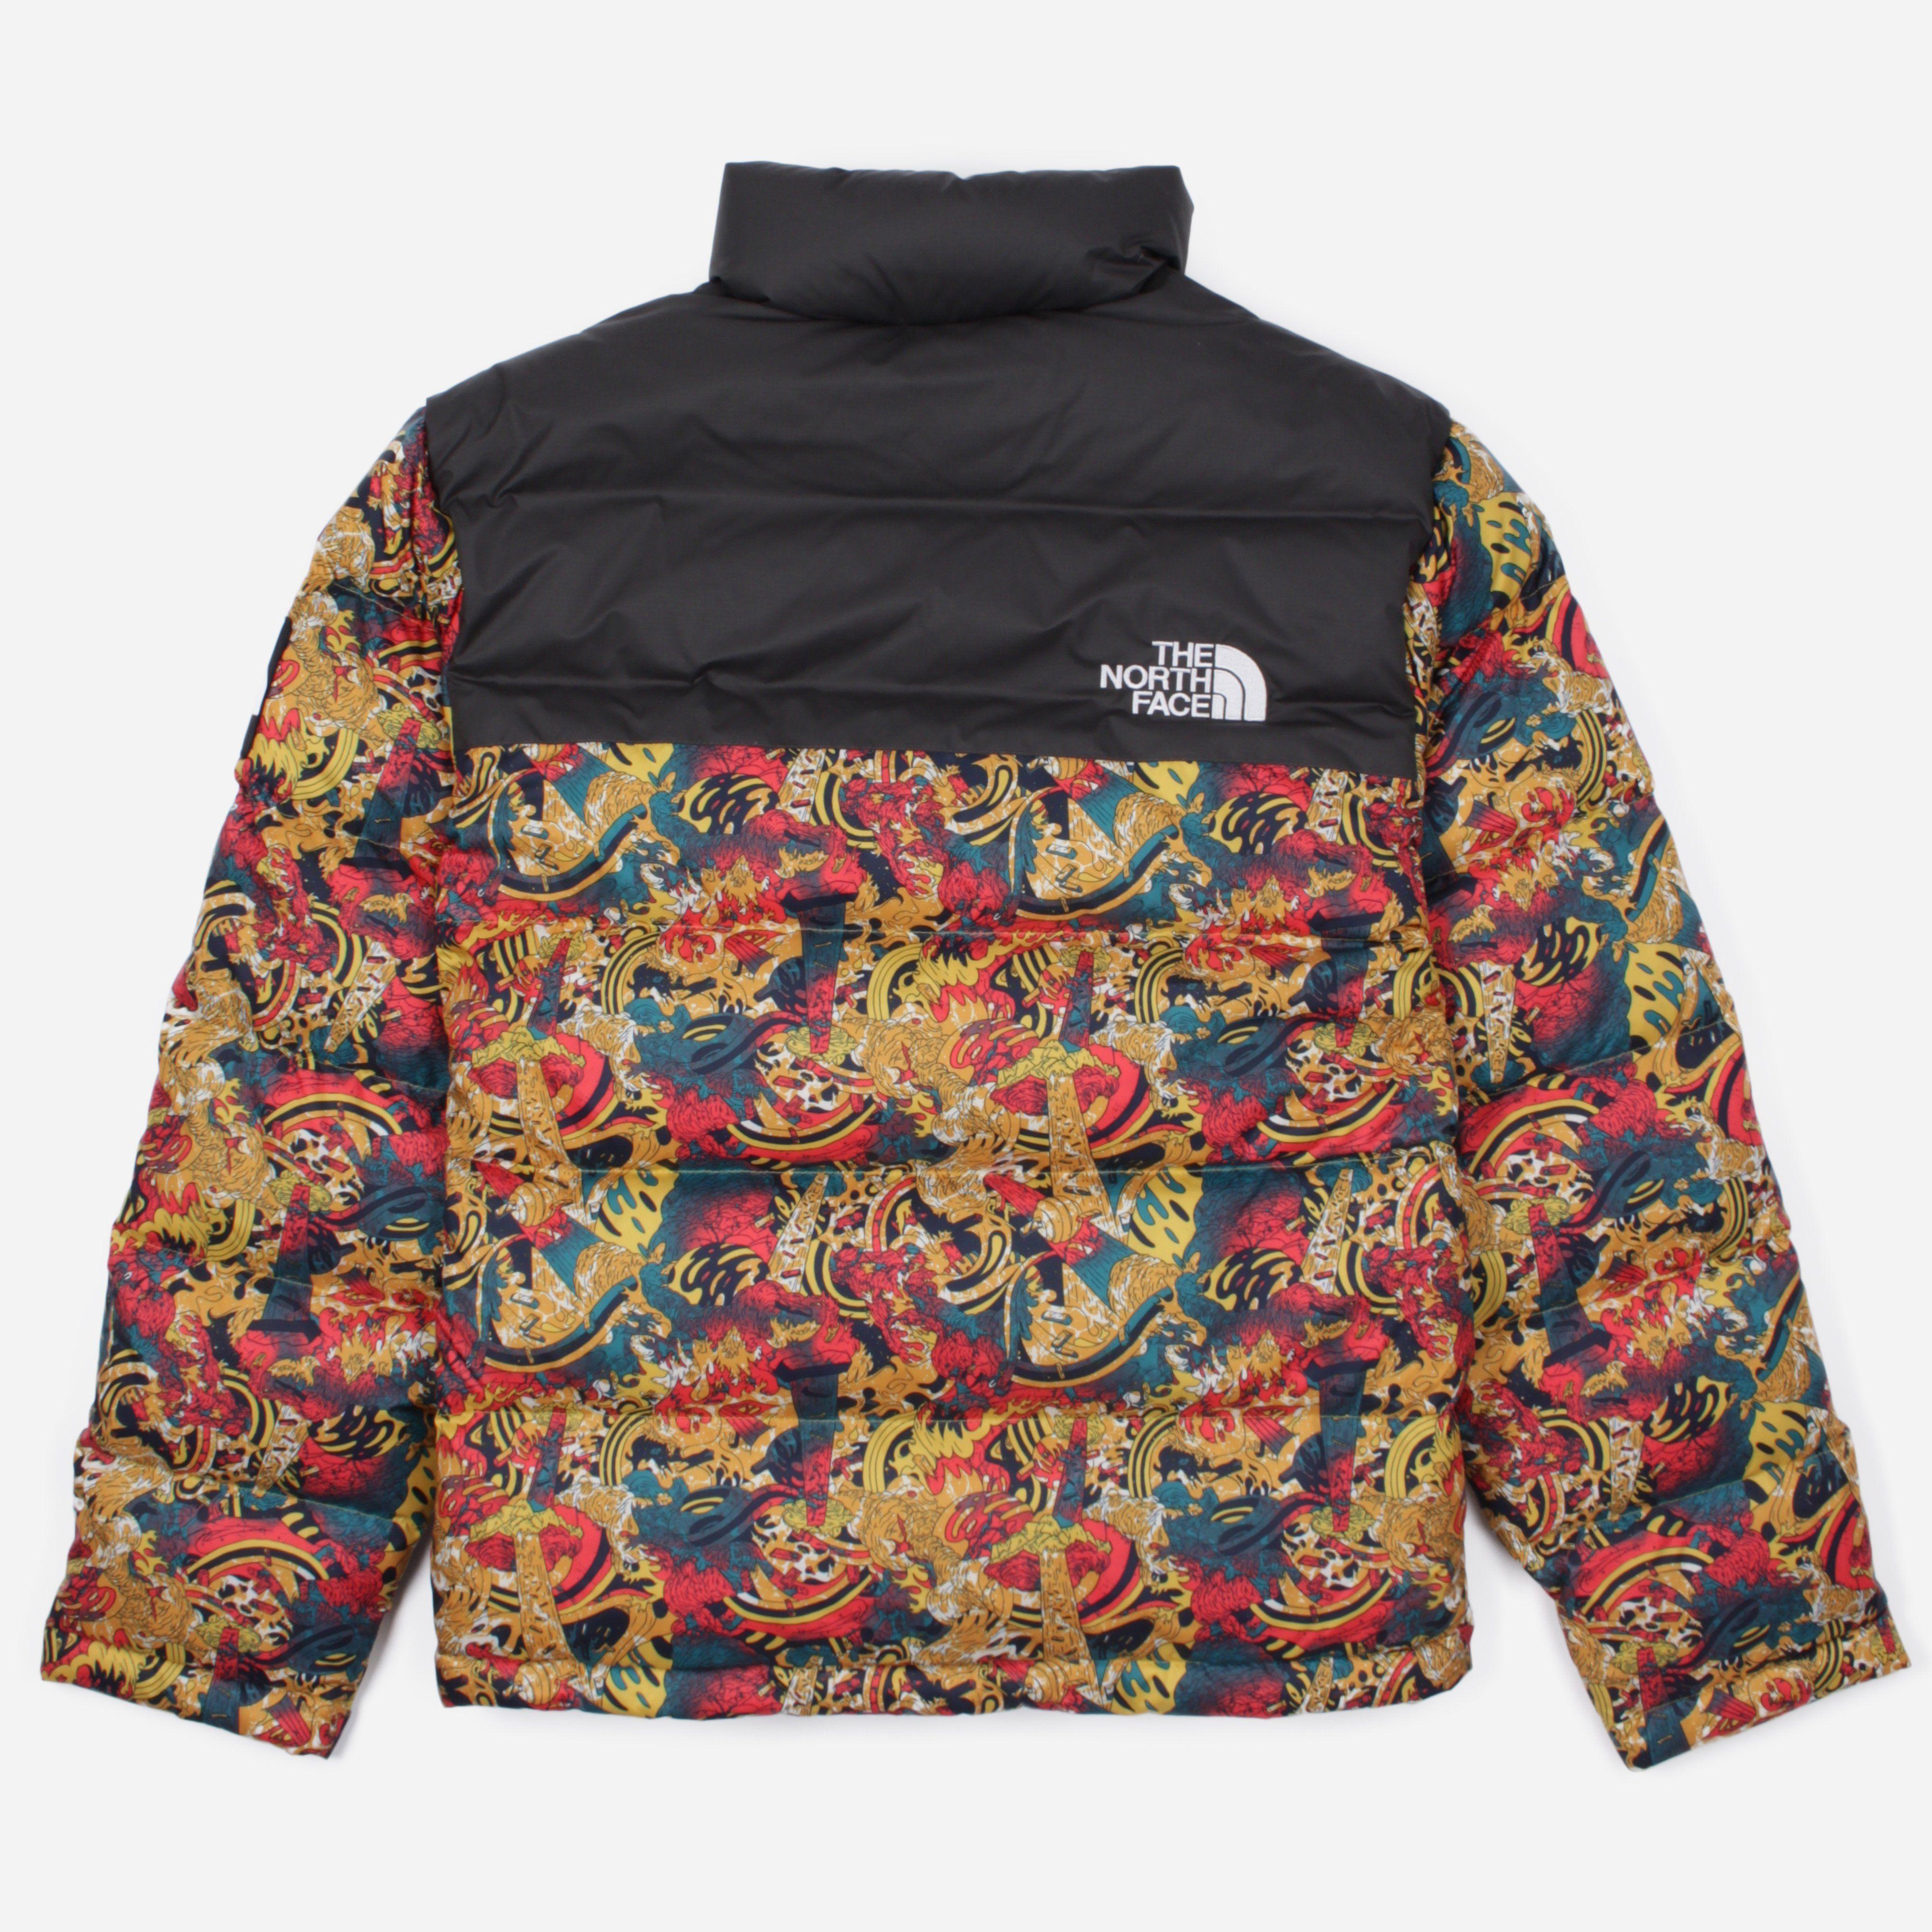 The North Face 1992 Nuptse Jacket